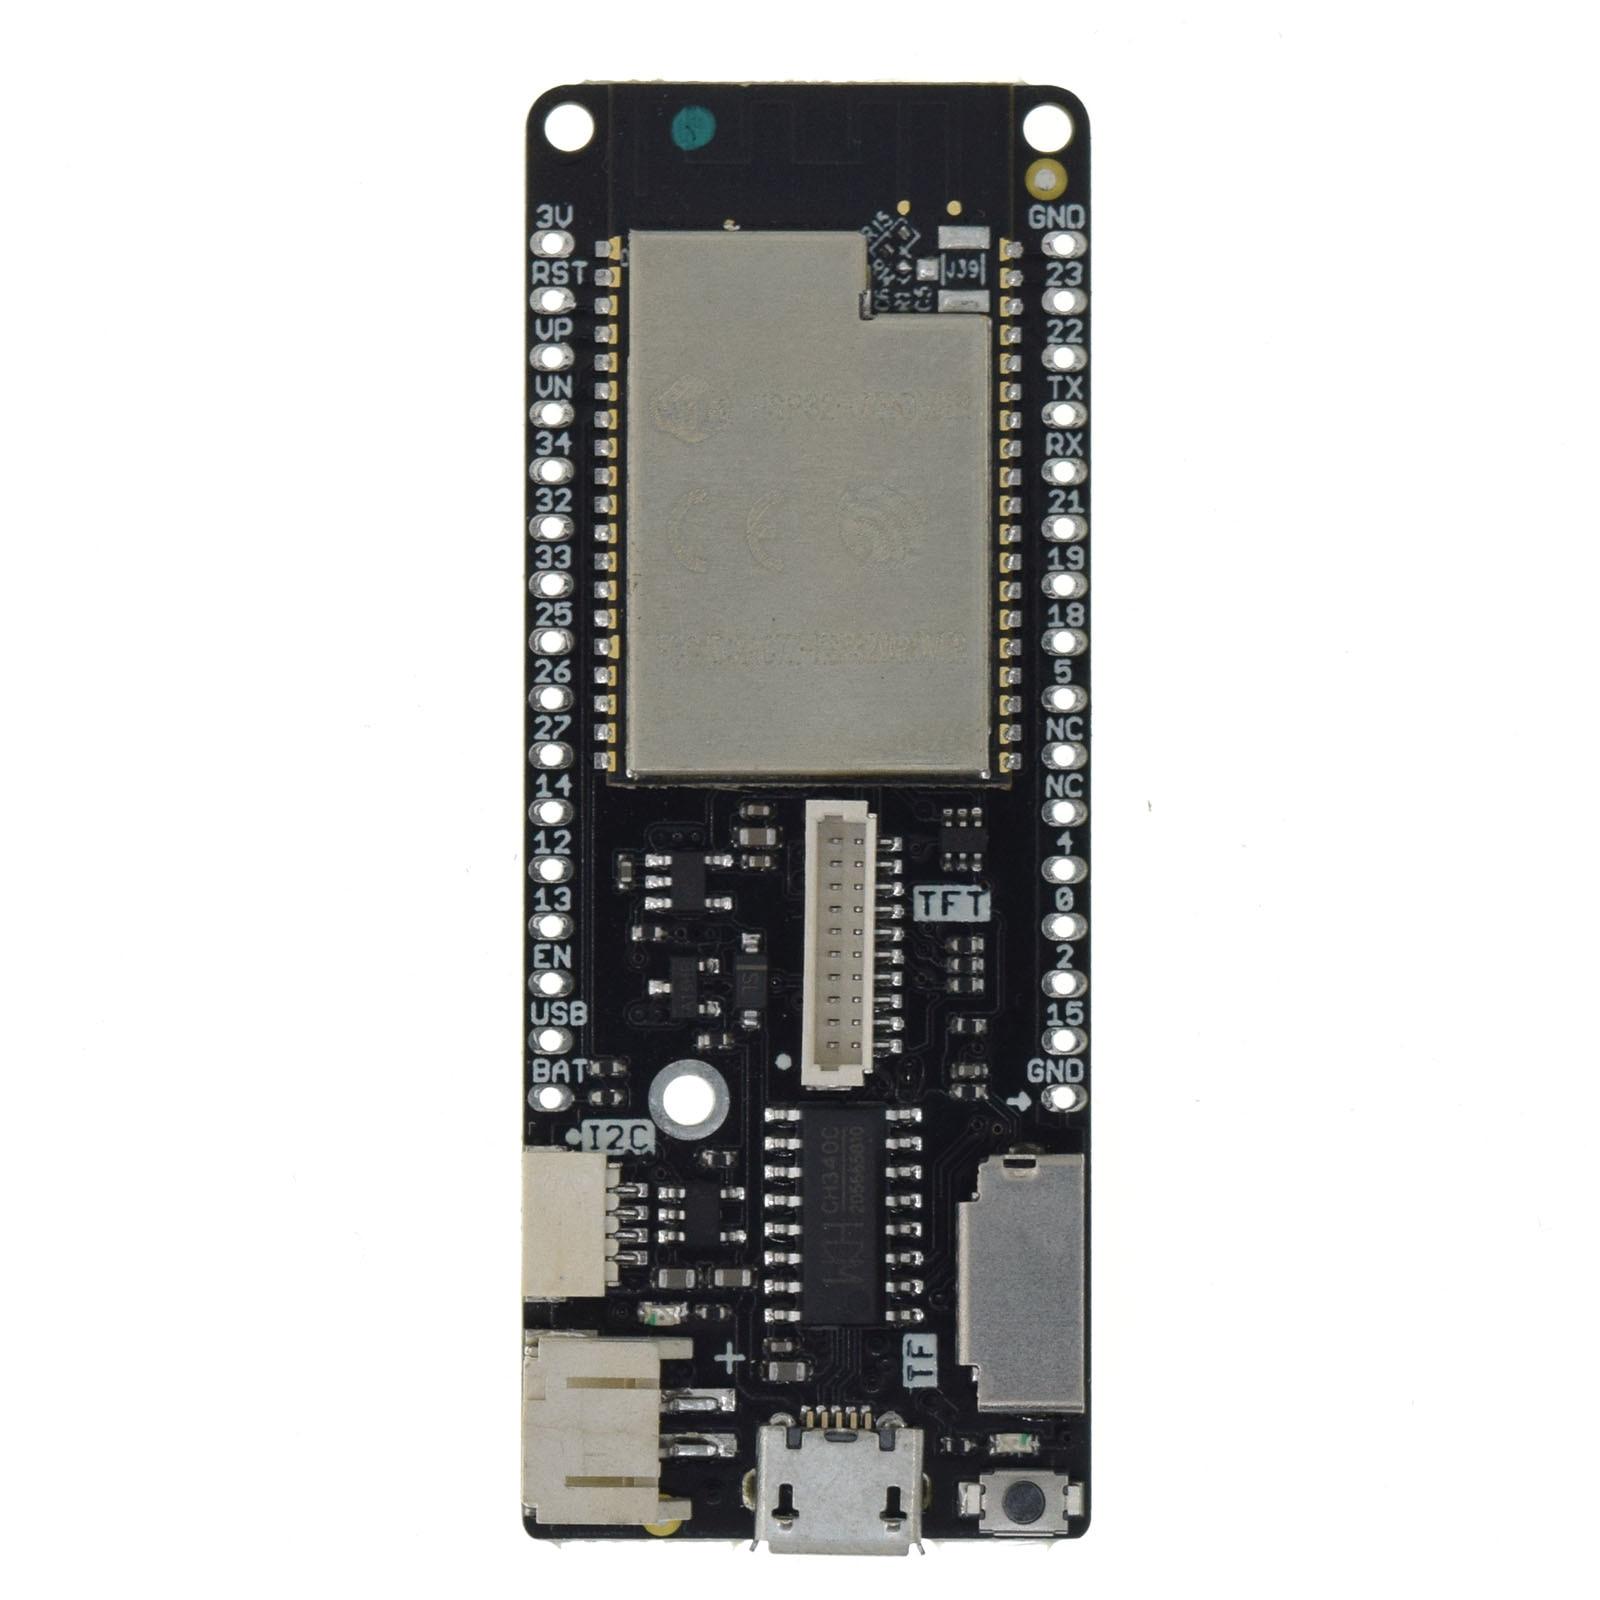 LOLIN D32 Pro V2.0.0 - wifi & bluetooth board based ESP-32 esp32 Rev1 ESP32-WROVER 4MB FLASH PSRAM MicroPython